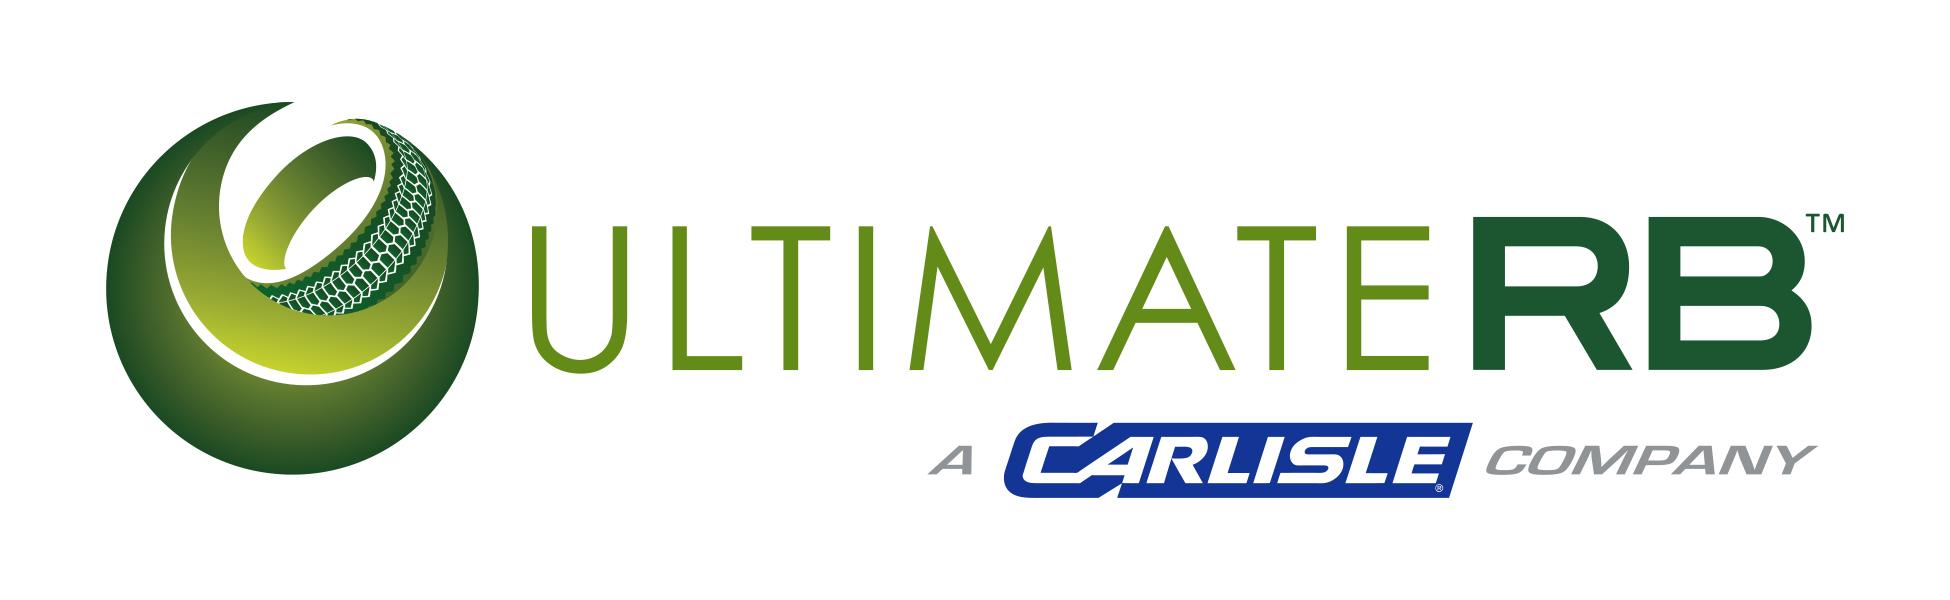 CRP-9405 Ultimate RB A Carlisle Company Logo PMS